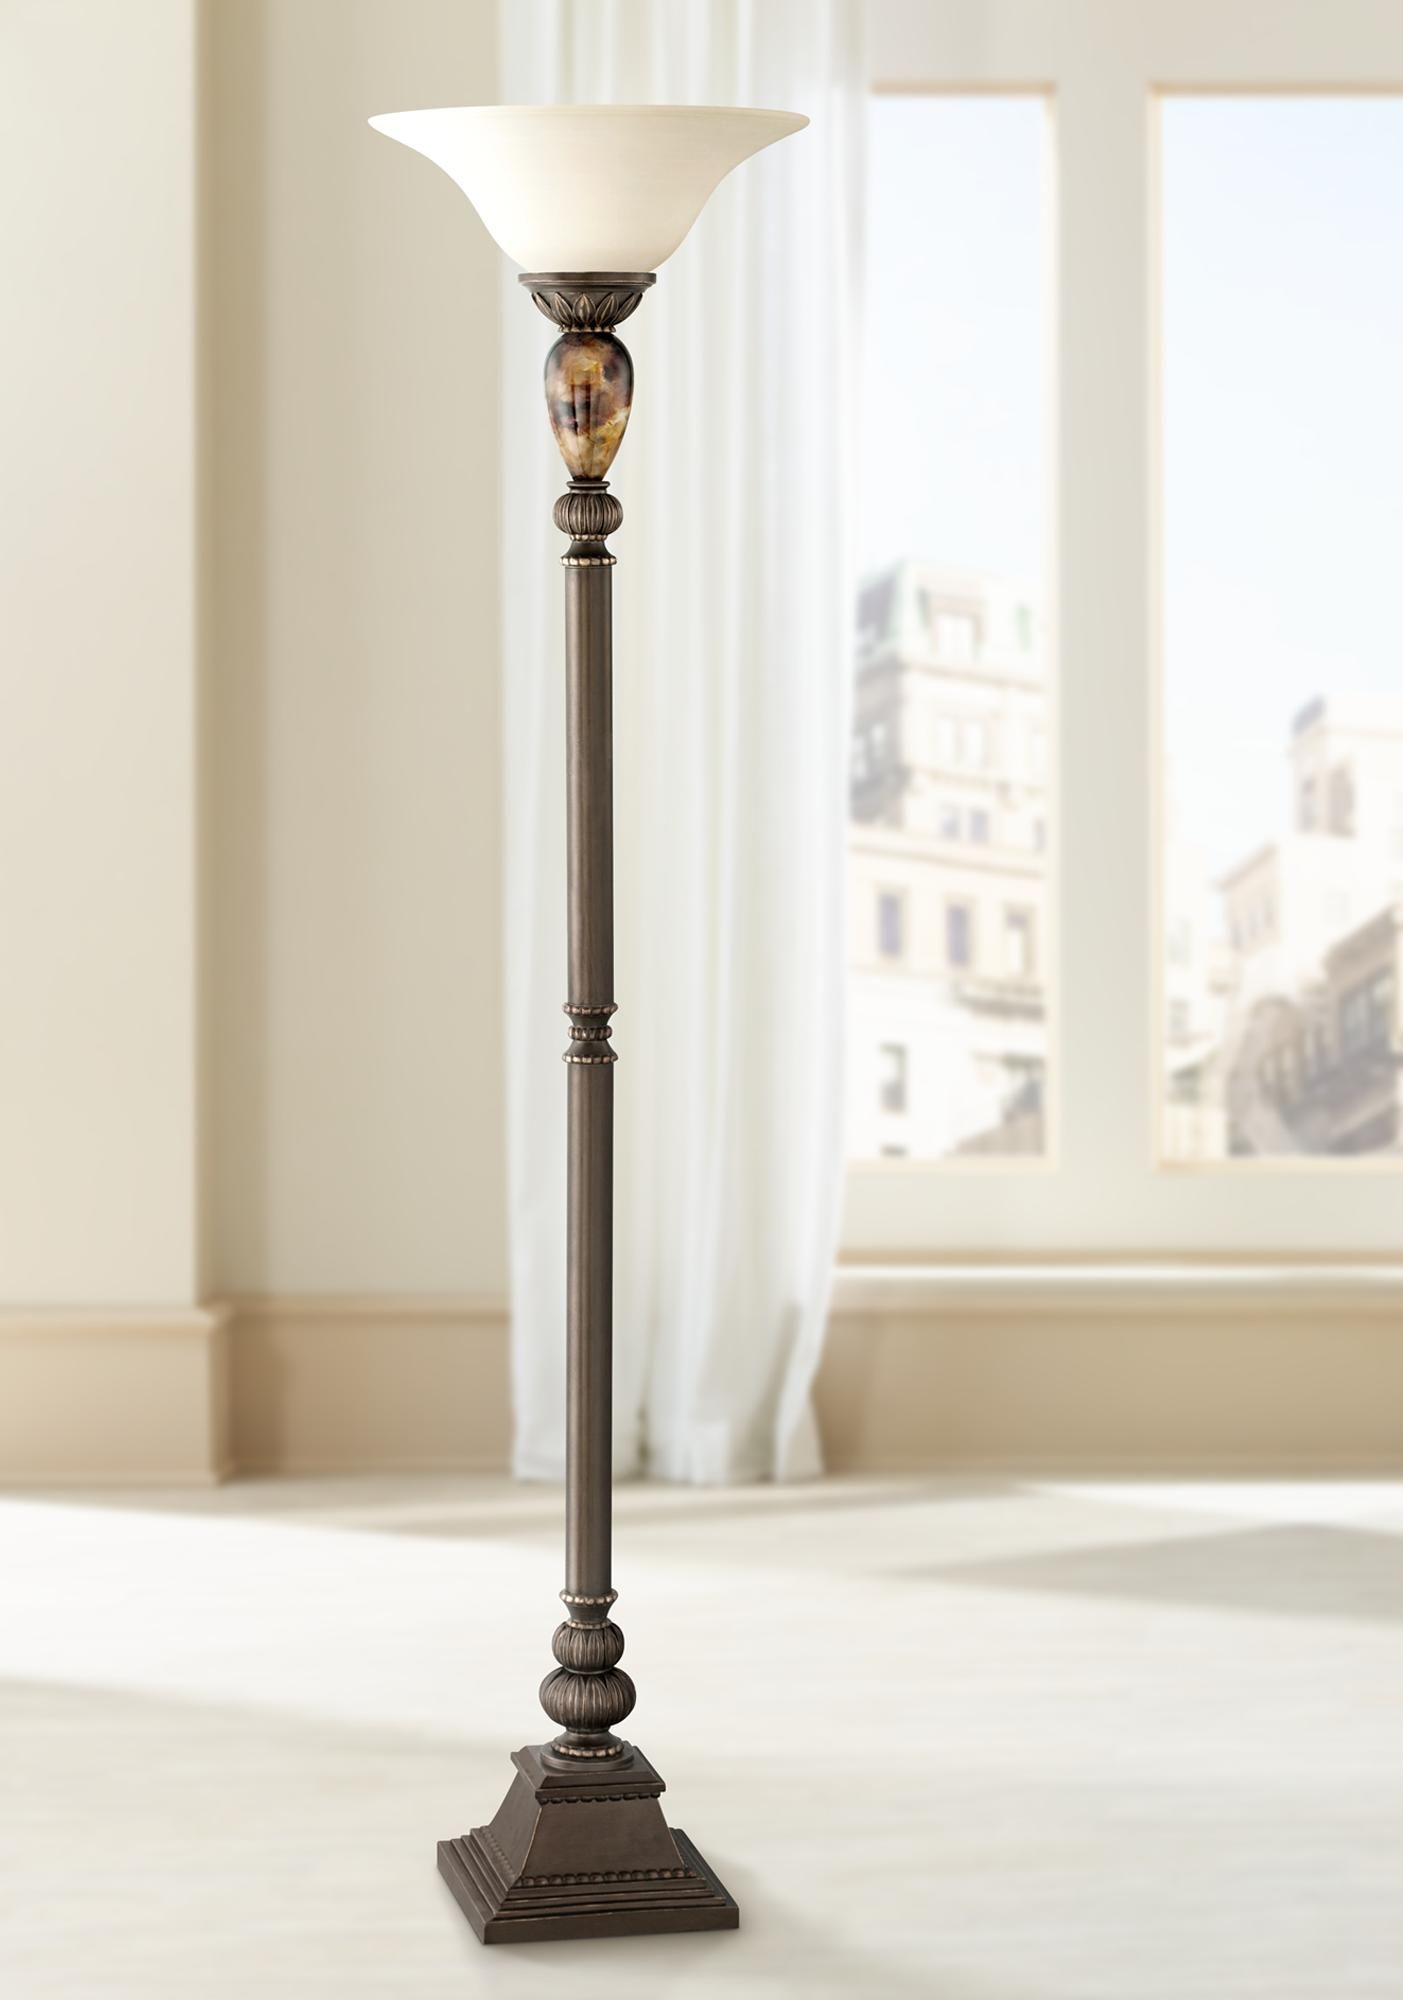 Floor Lamps Kathy Ireland Mulholland 72 High Torchiere Floor Lamp In 2020 Torchiere Floor Lamp Floor Lamp Traditional Floor Lamps